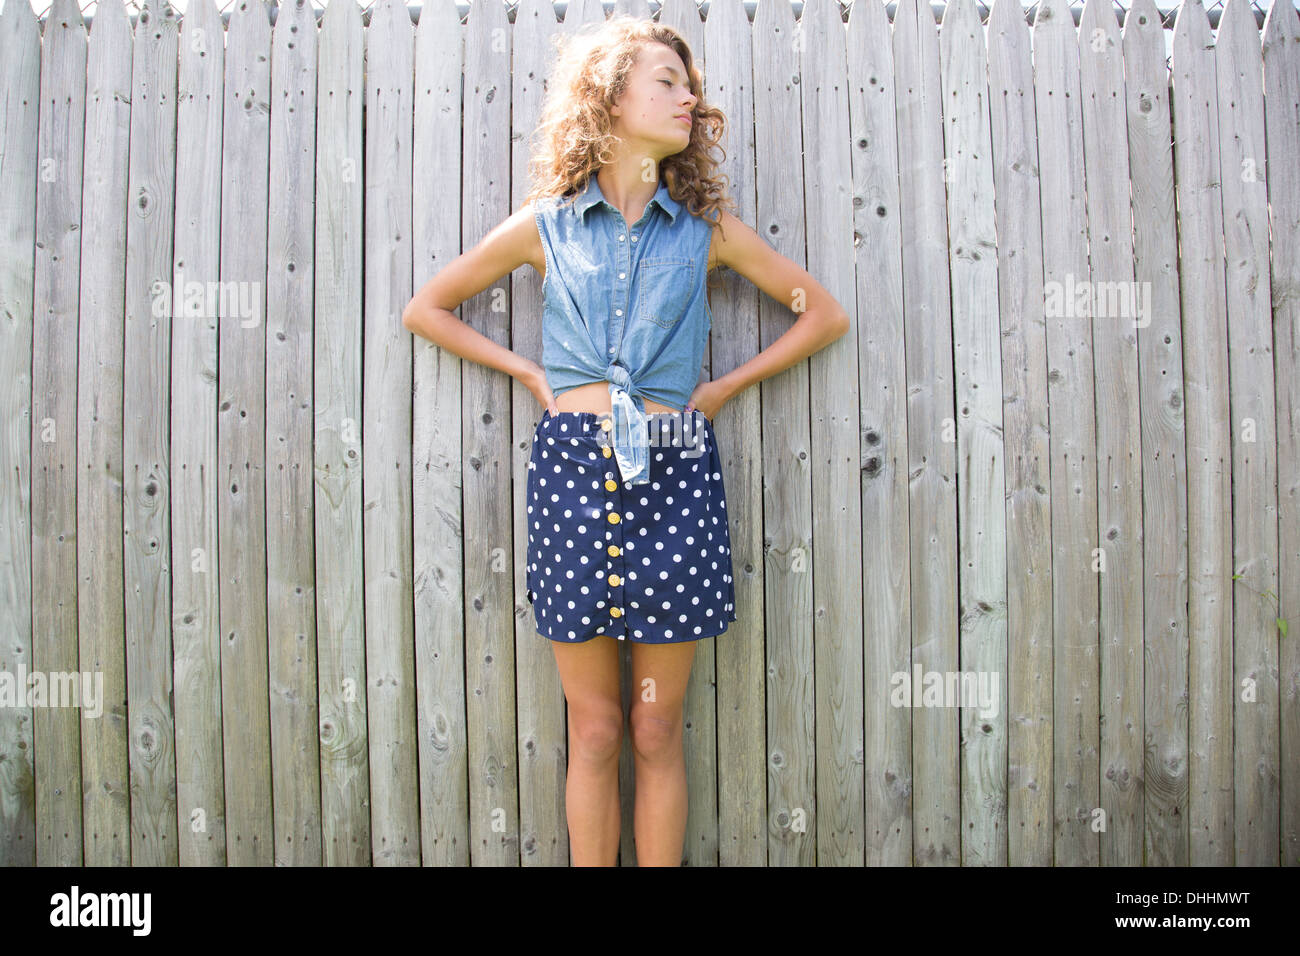 Porträt des Mädchens vor Holzzaun Stockfoto